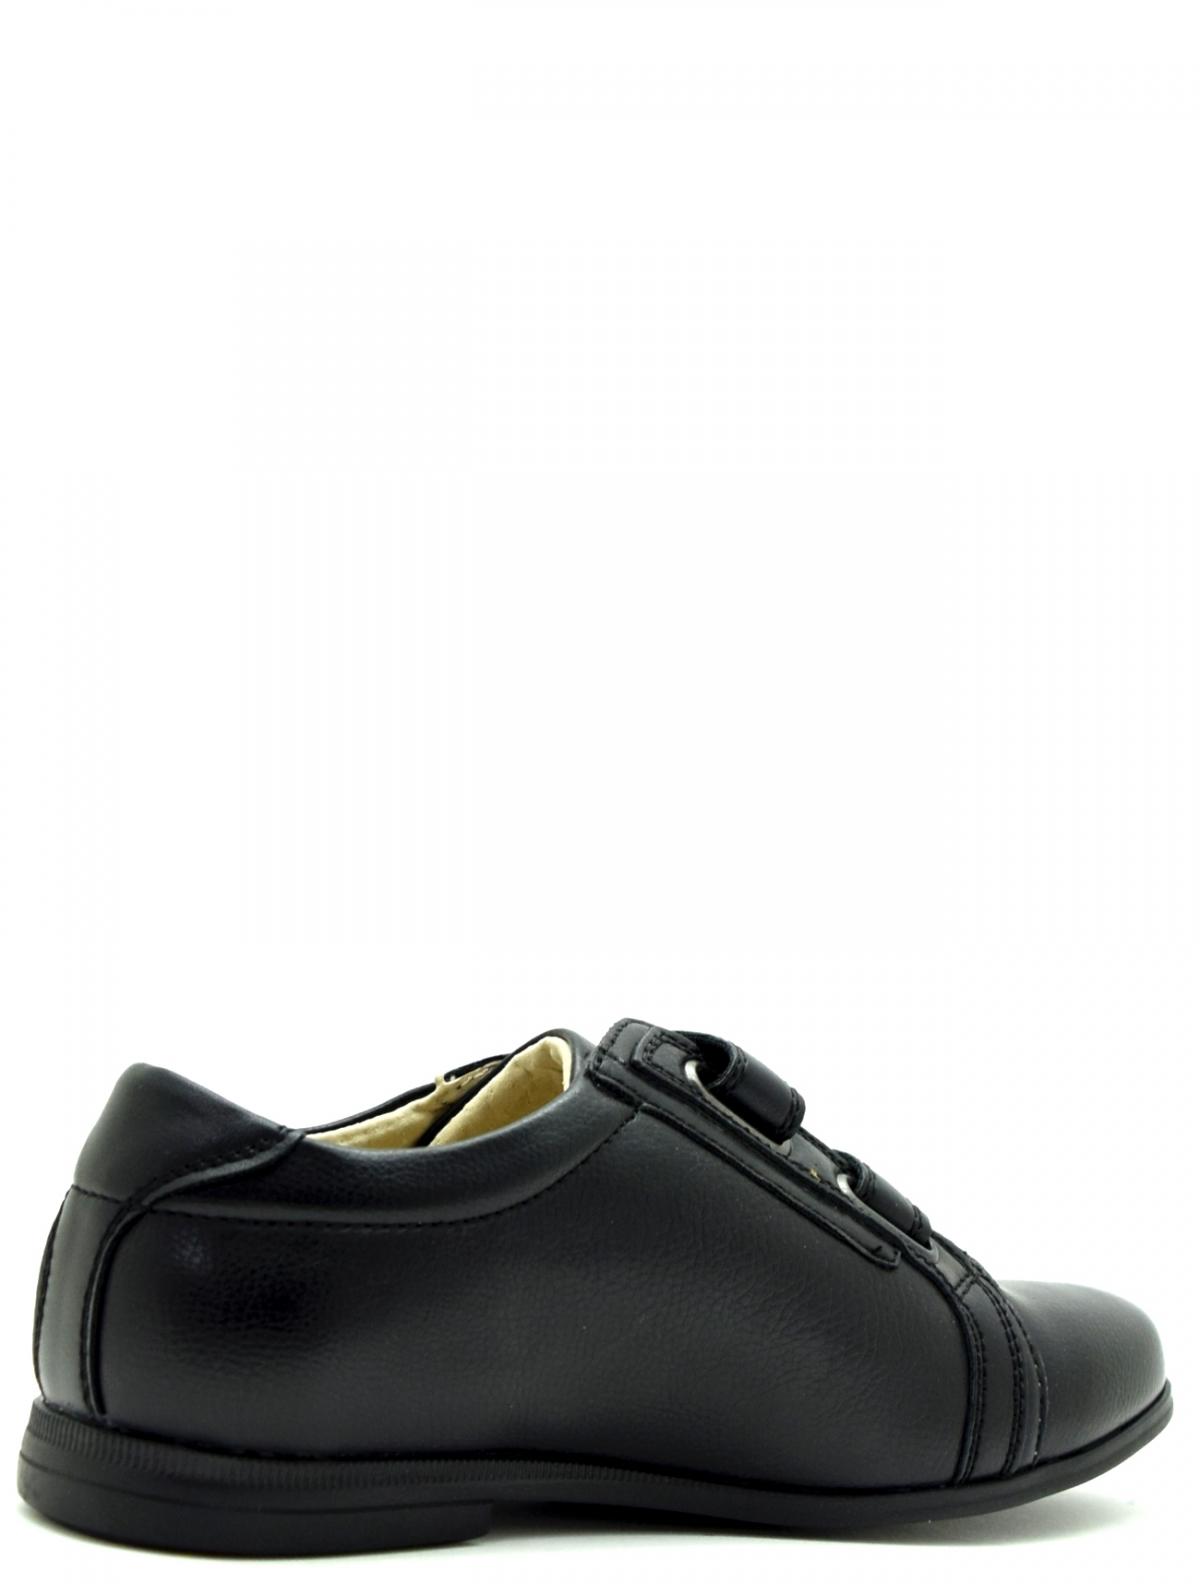 D14662-BK туфли для мальчика